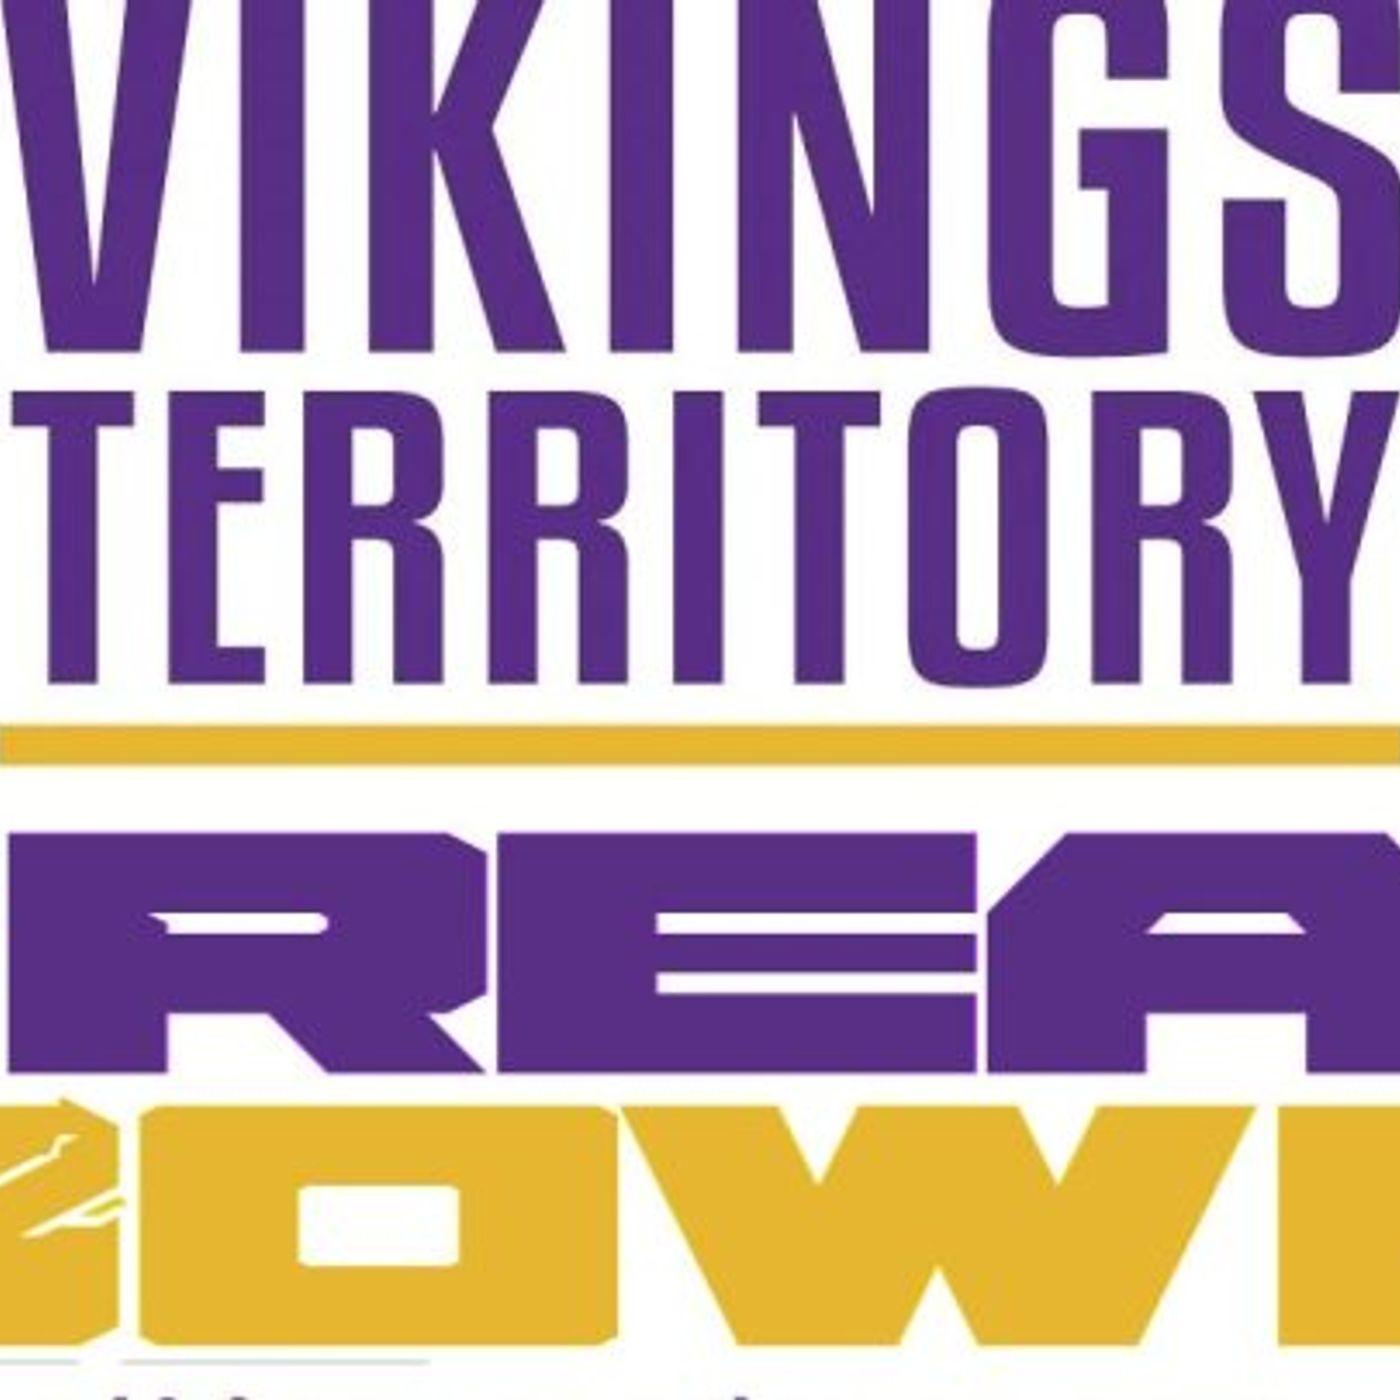 The VikingsTerritory Breakdown - Ranking the Vikings